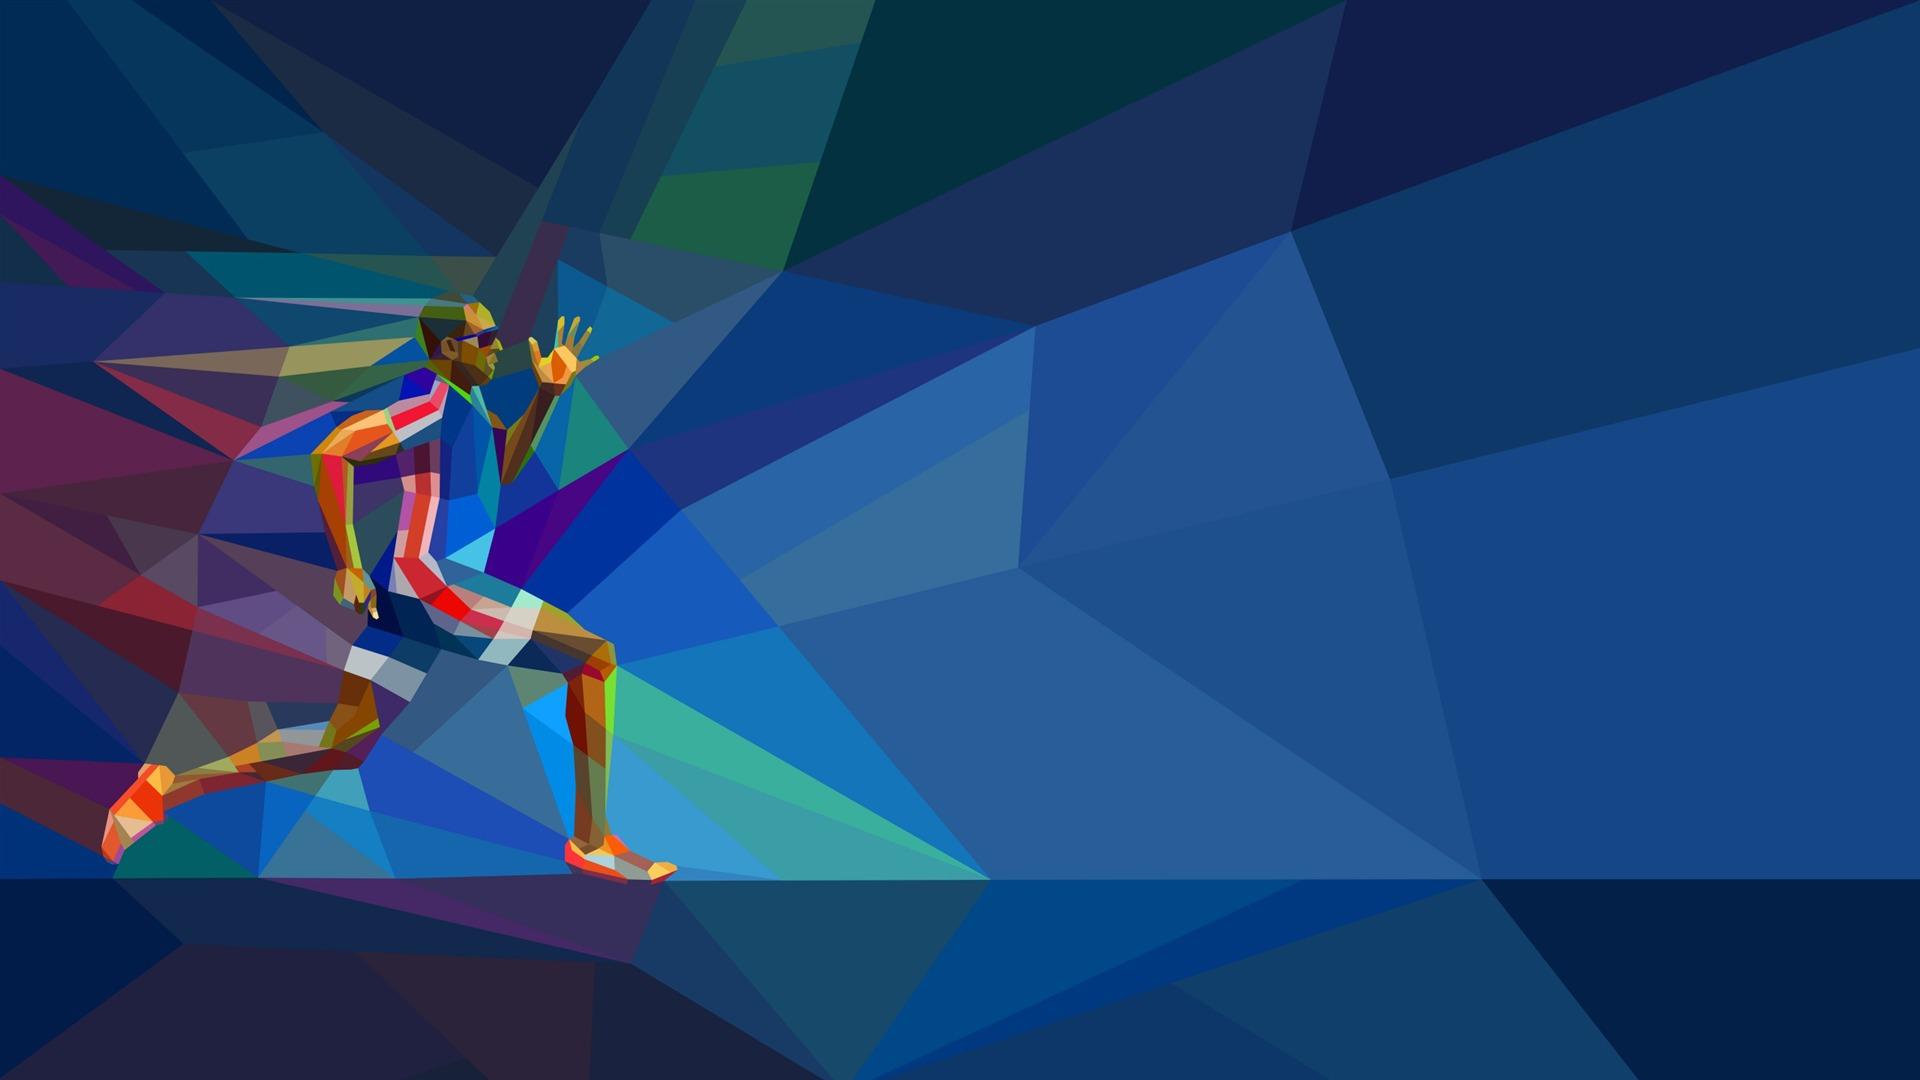 Runner Rio 2016 Juegos Olímpicos Hd Vector Wallpapers Avance